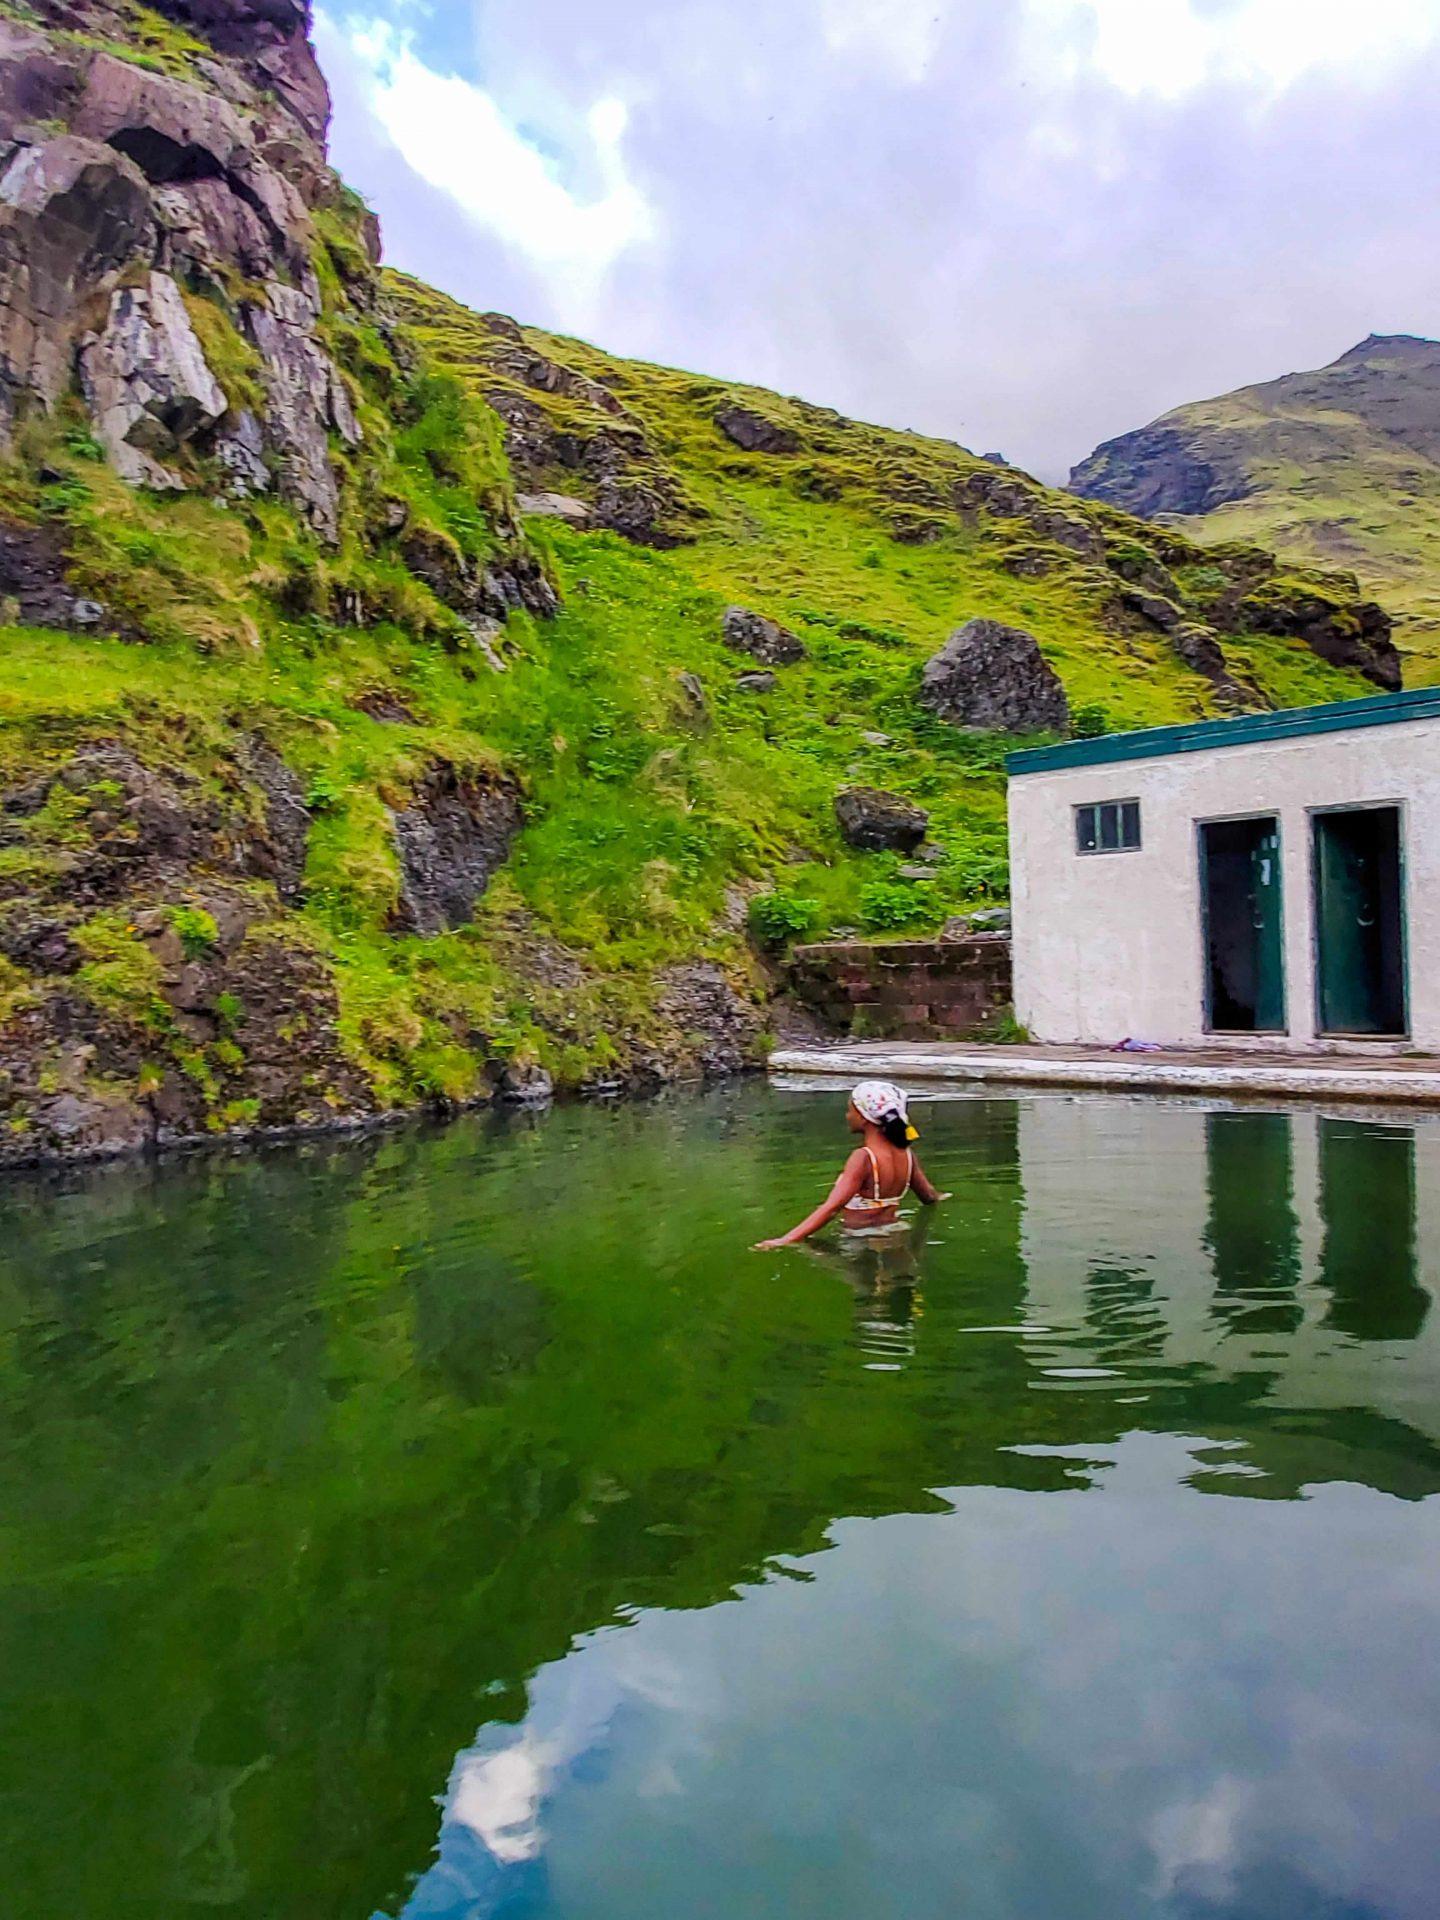 Seljavallalaug Nature Bath